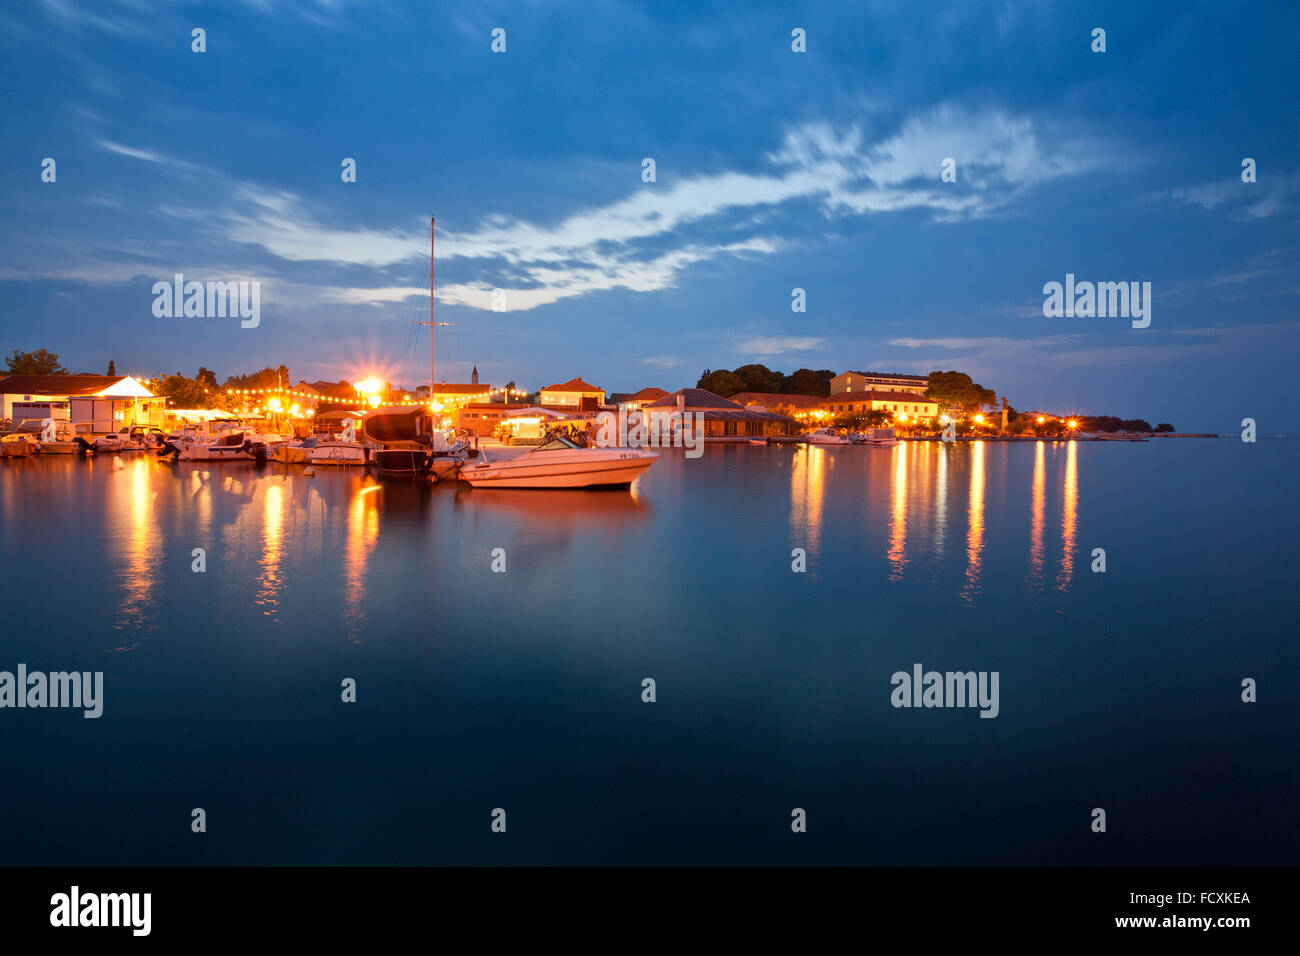 Place Ugljan in the evening, island Ugljan, Dalmatia, Croatia - Stock Image